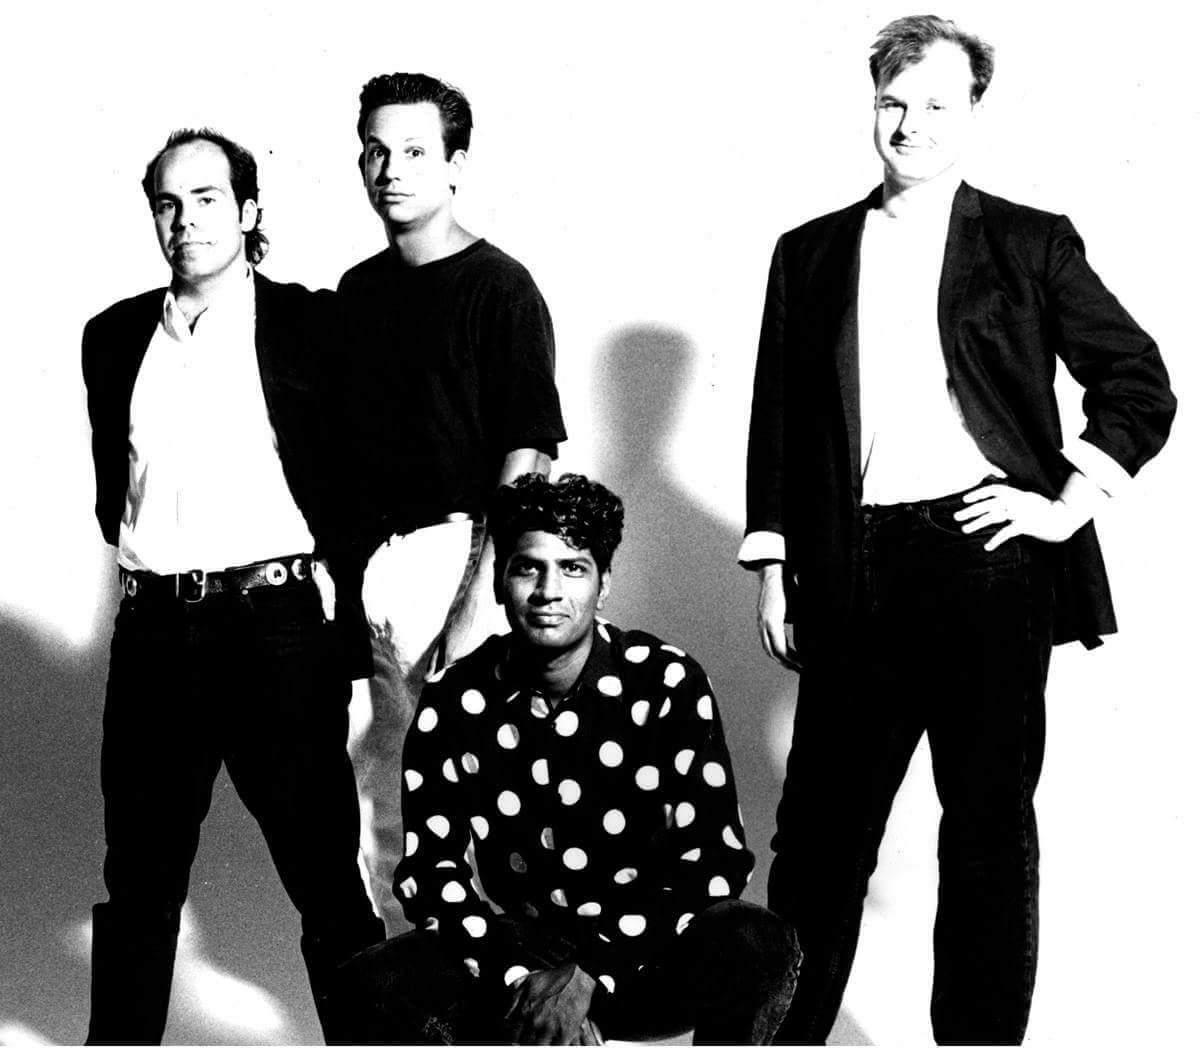 Between the Lines - Circa 1990